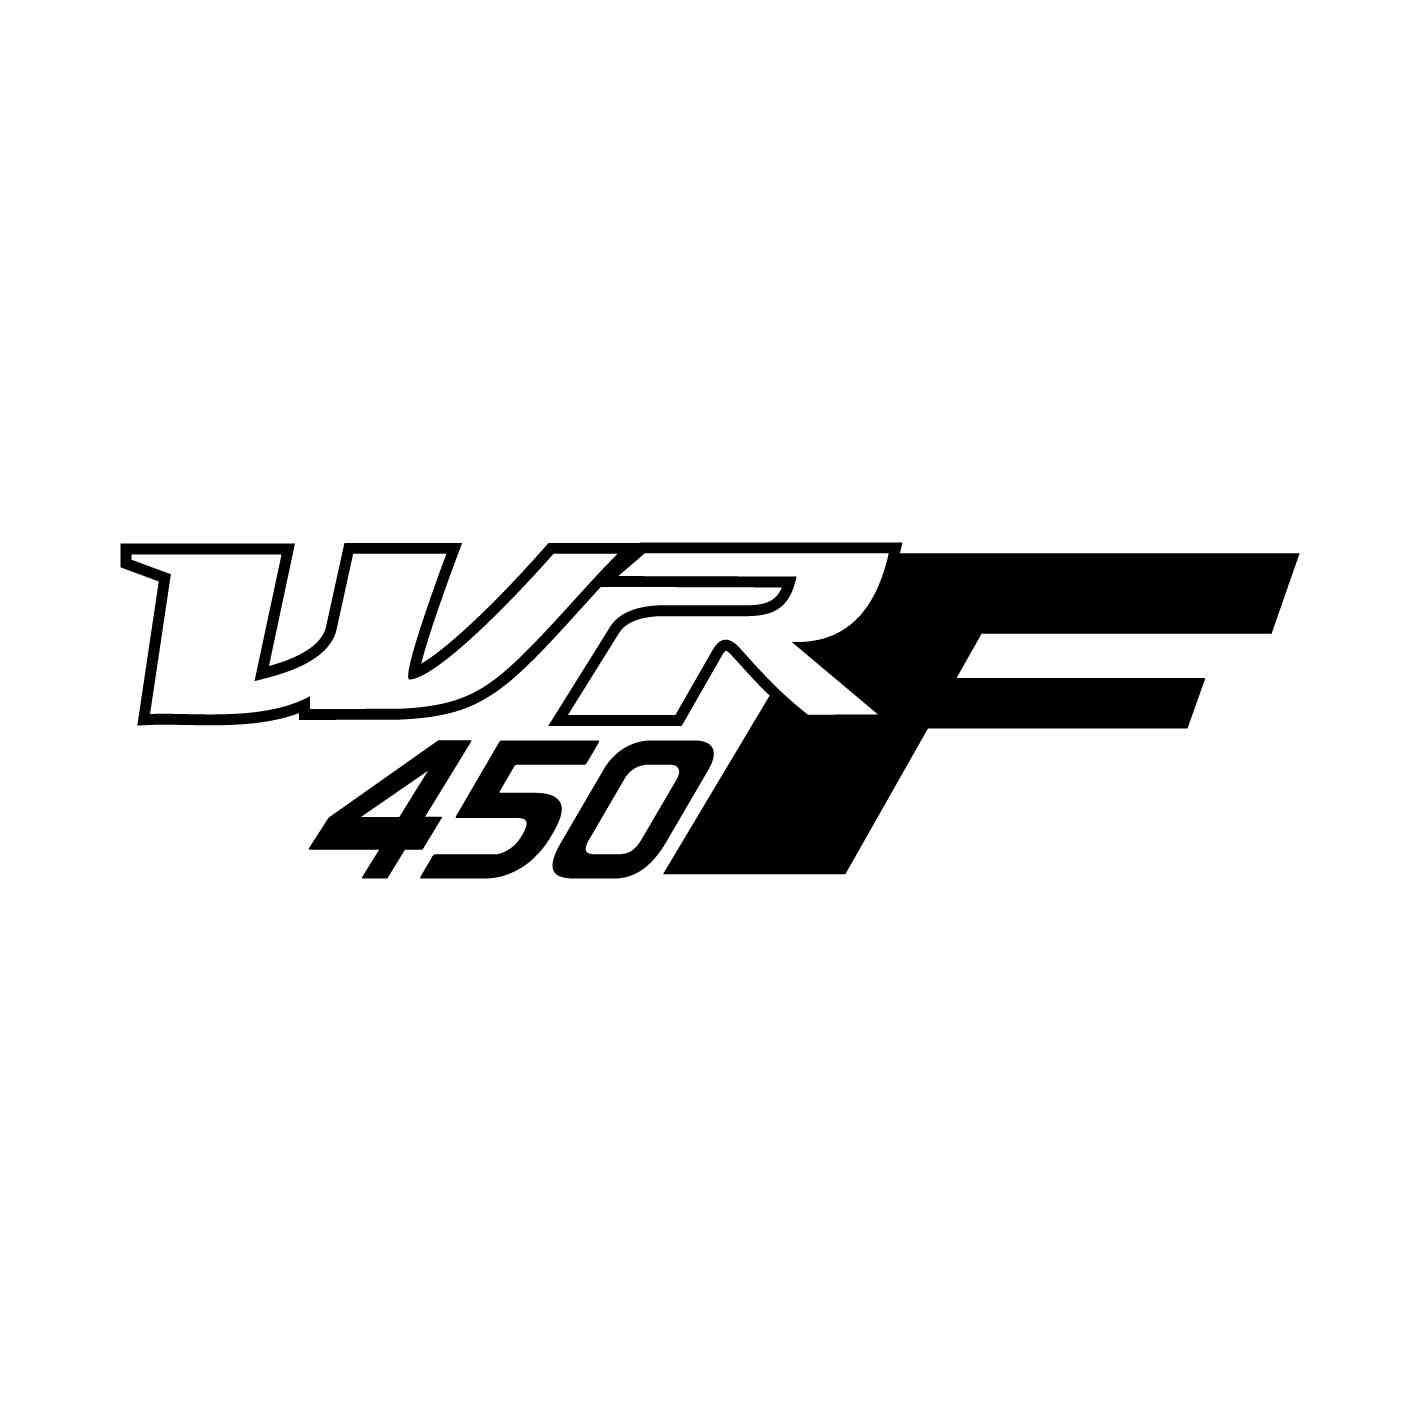 yamaha-ref52-wrf-450-stickers-moto-casque-scooter-sticker-autocollant-adhesifs